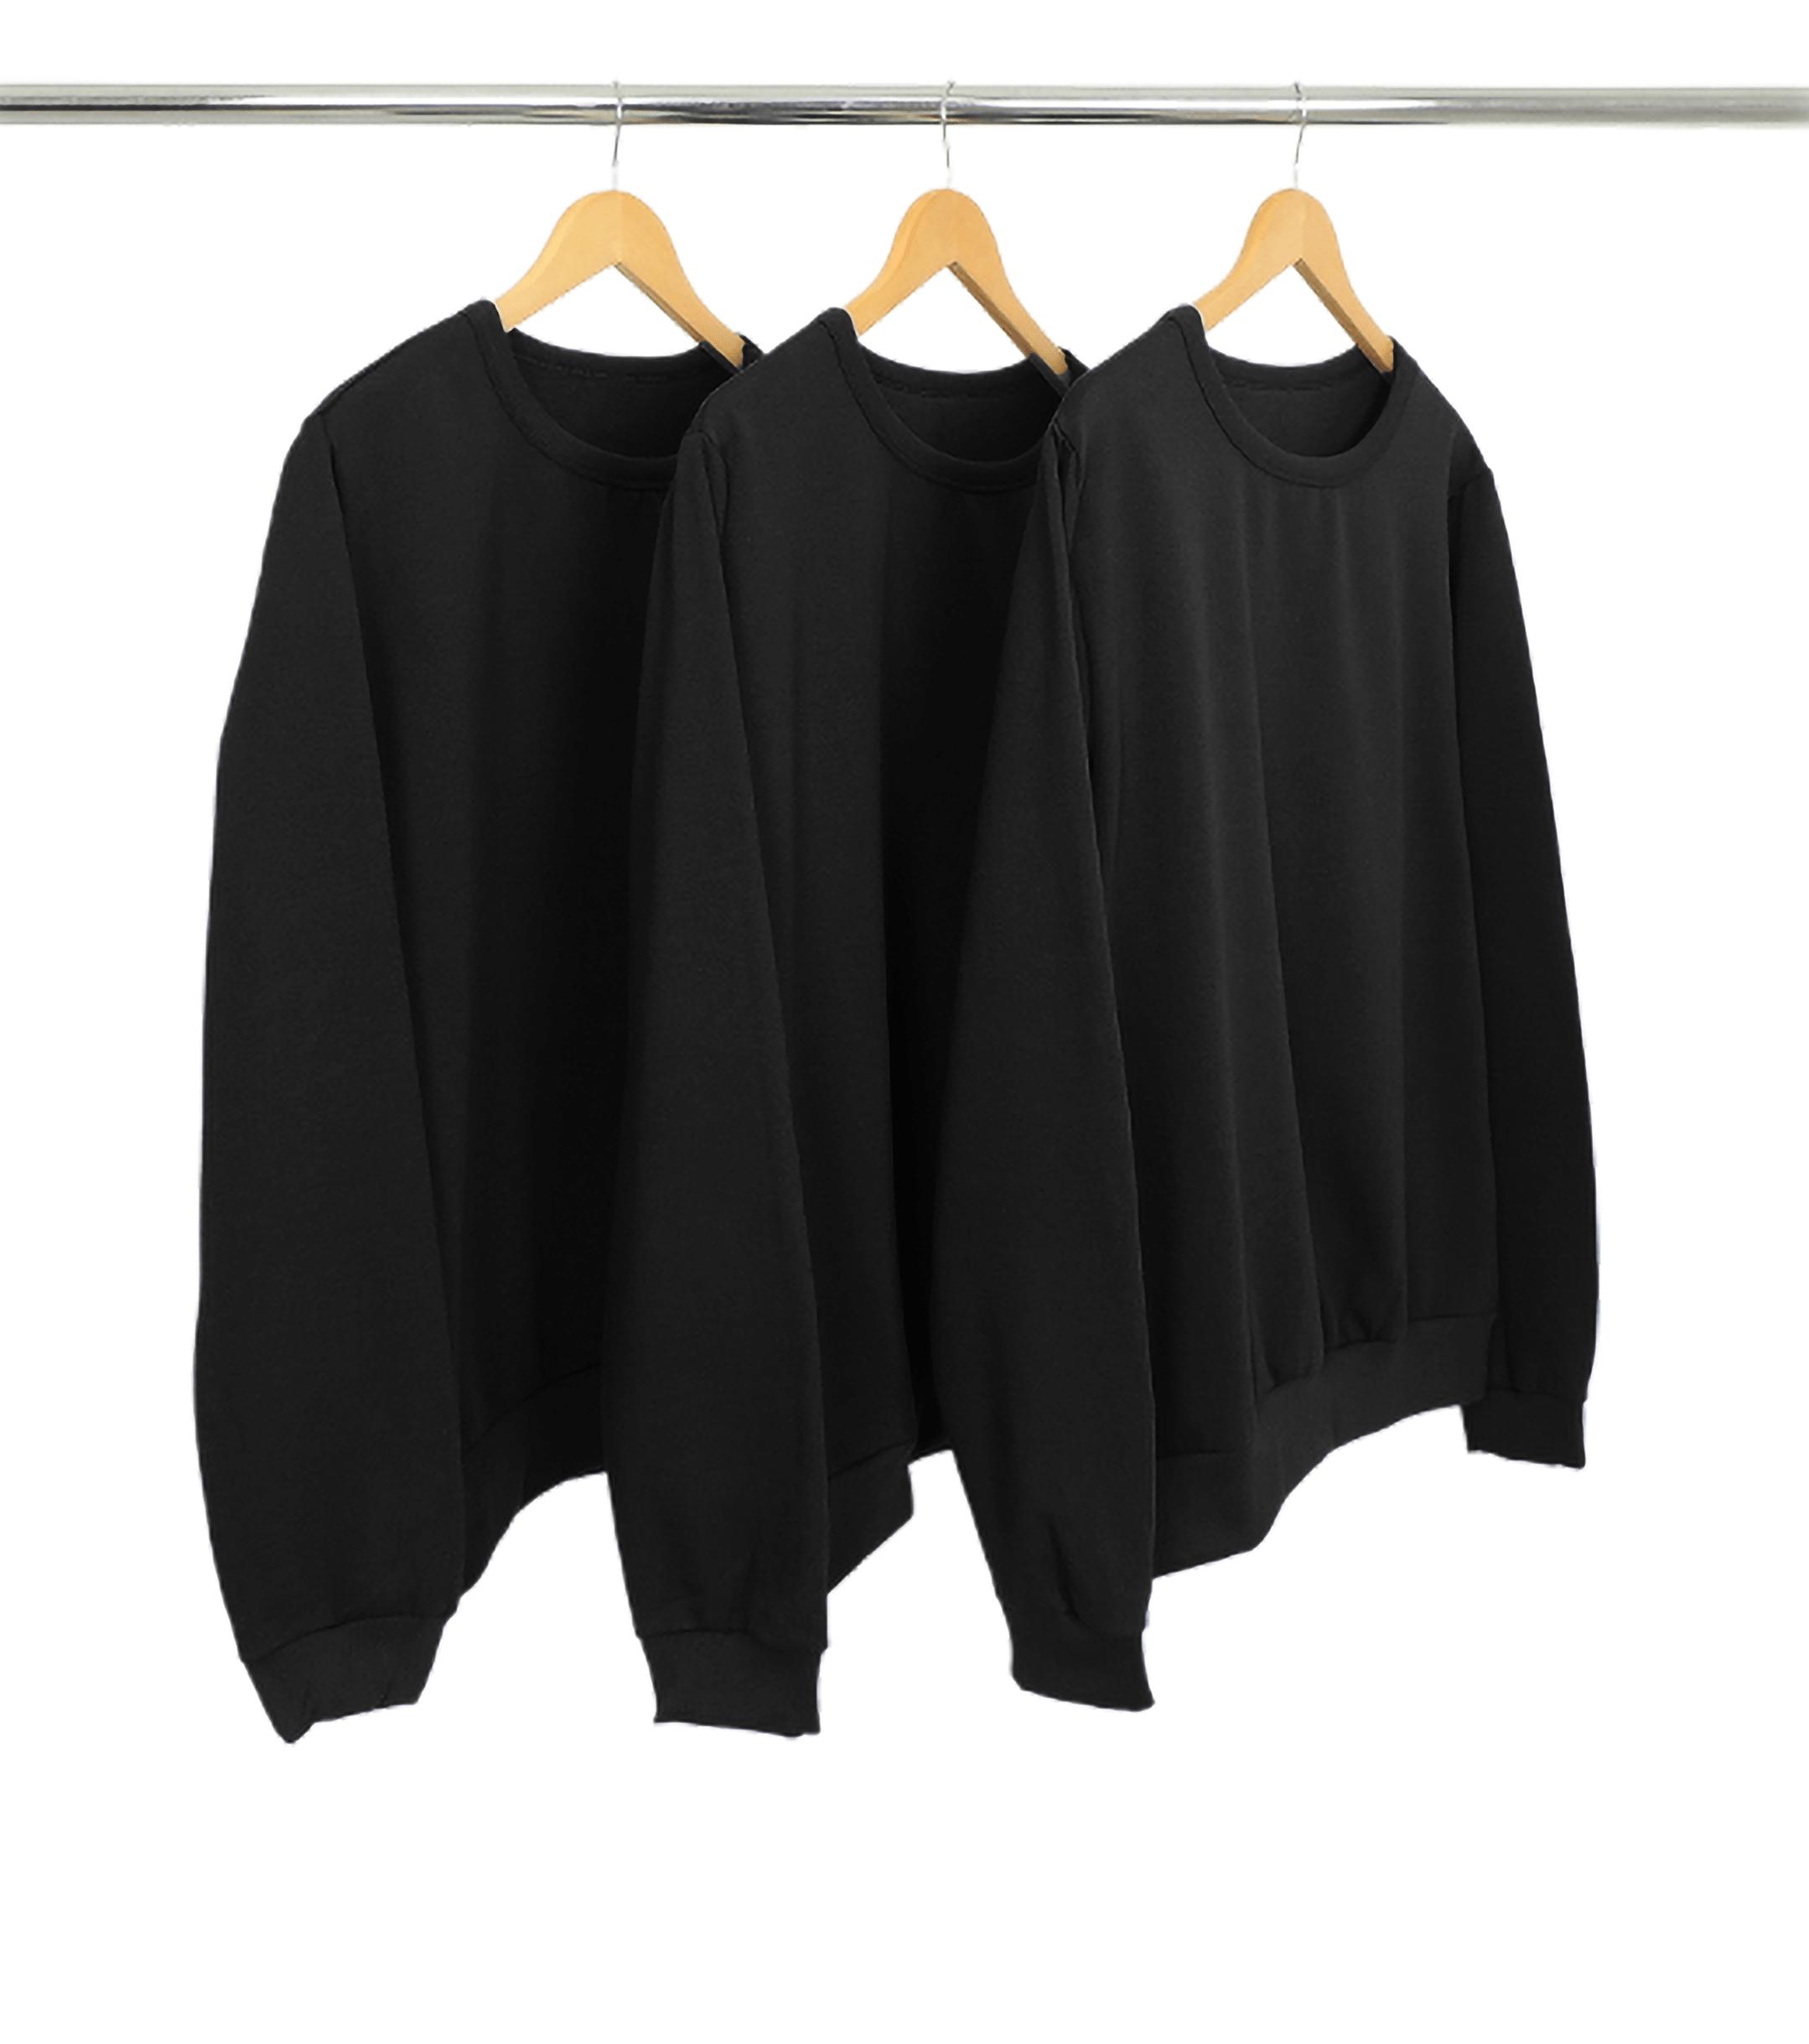 Kit 3 Blusões de Moletom Preto